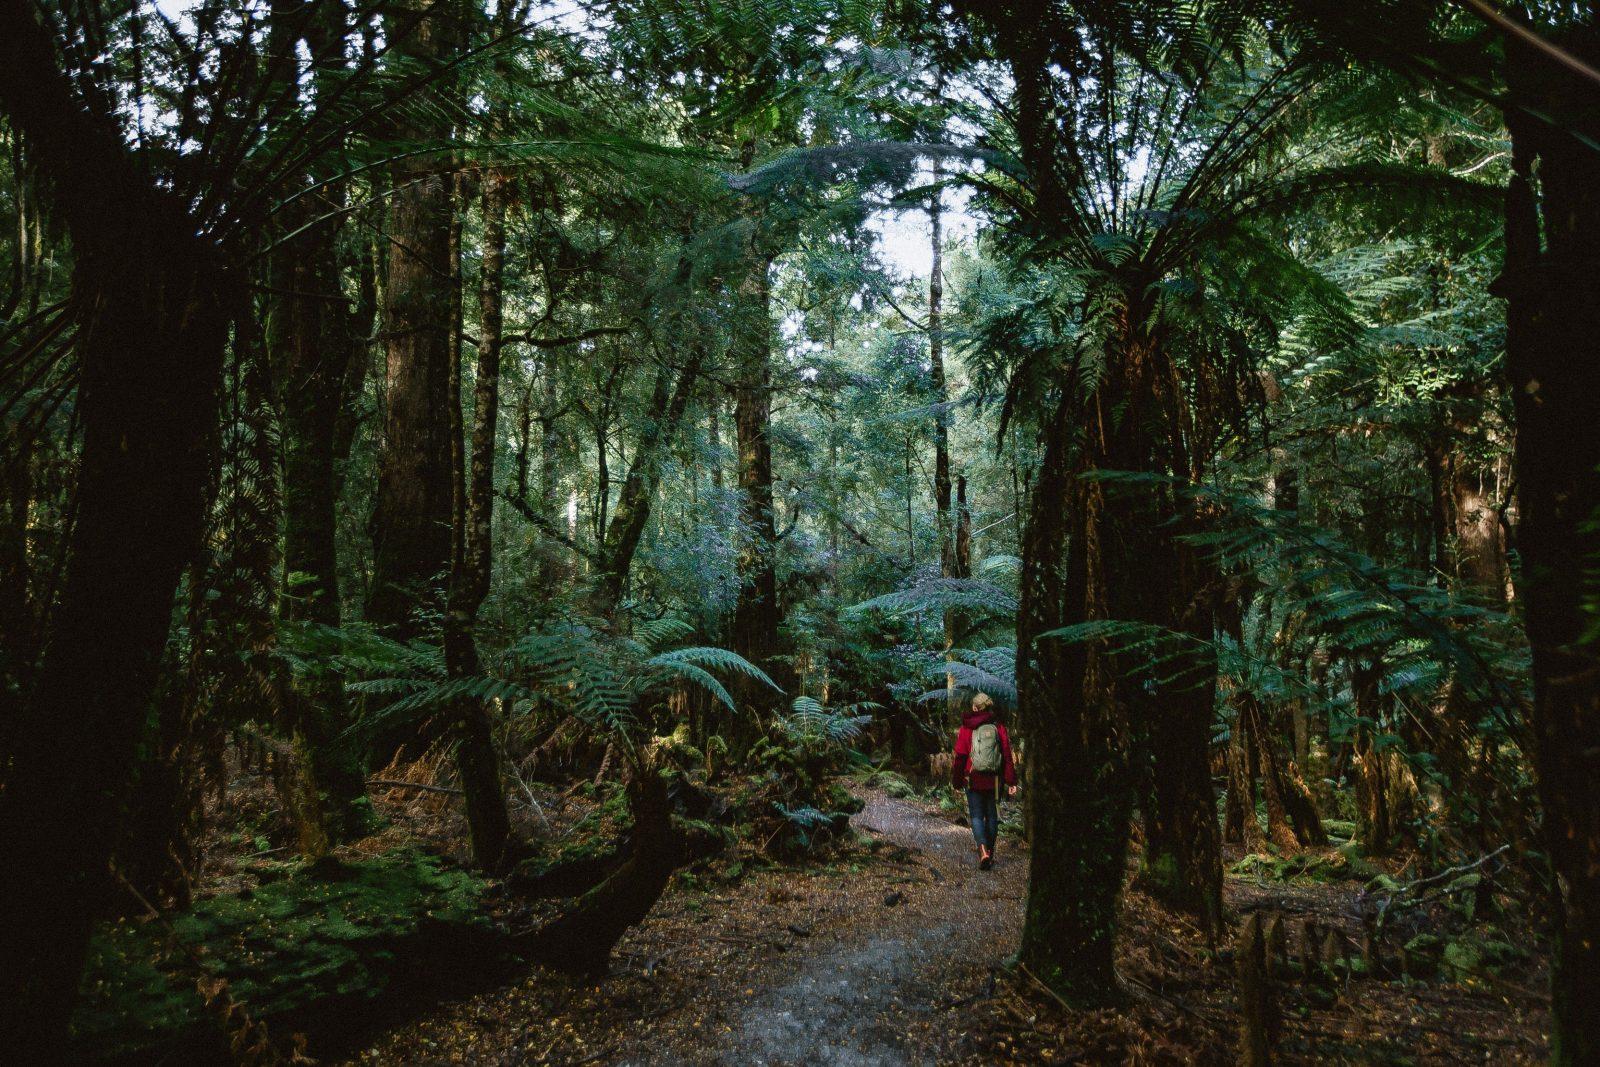 Tarkine Forest Reserve